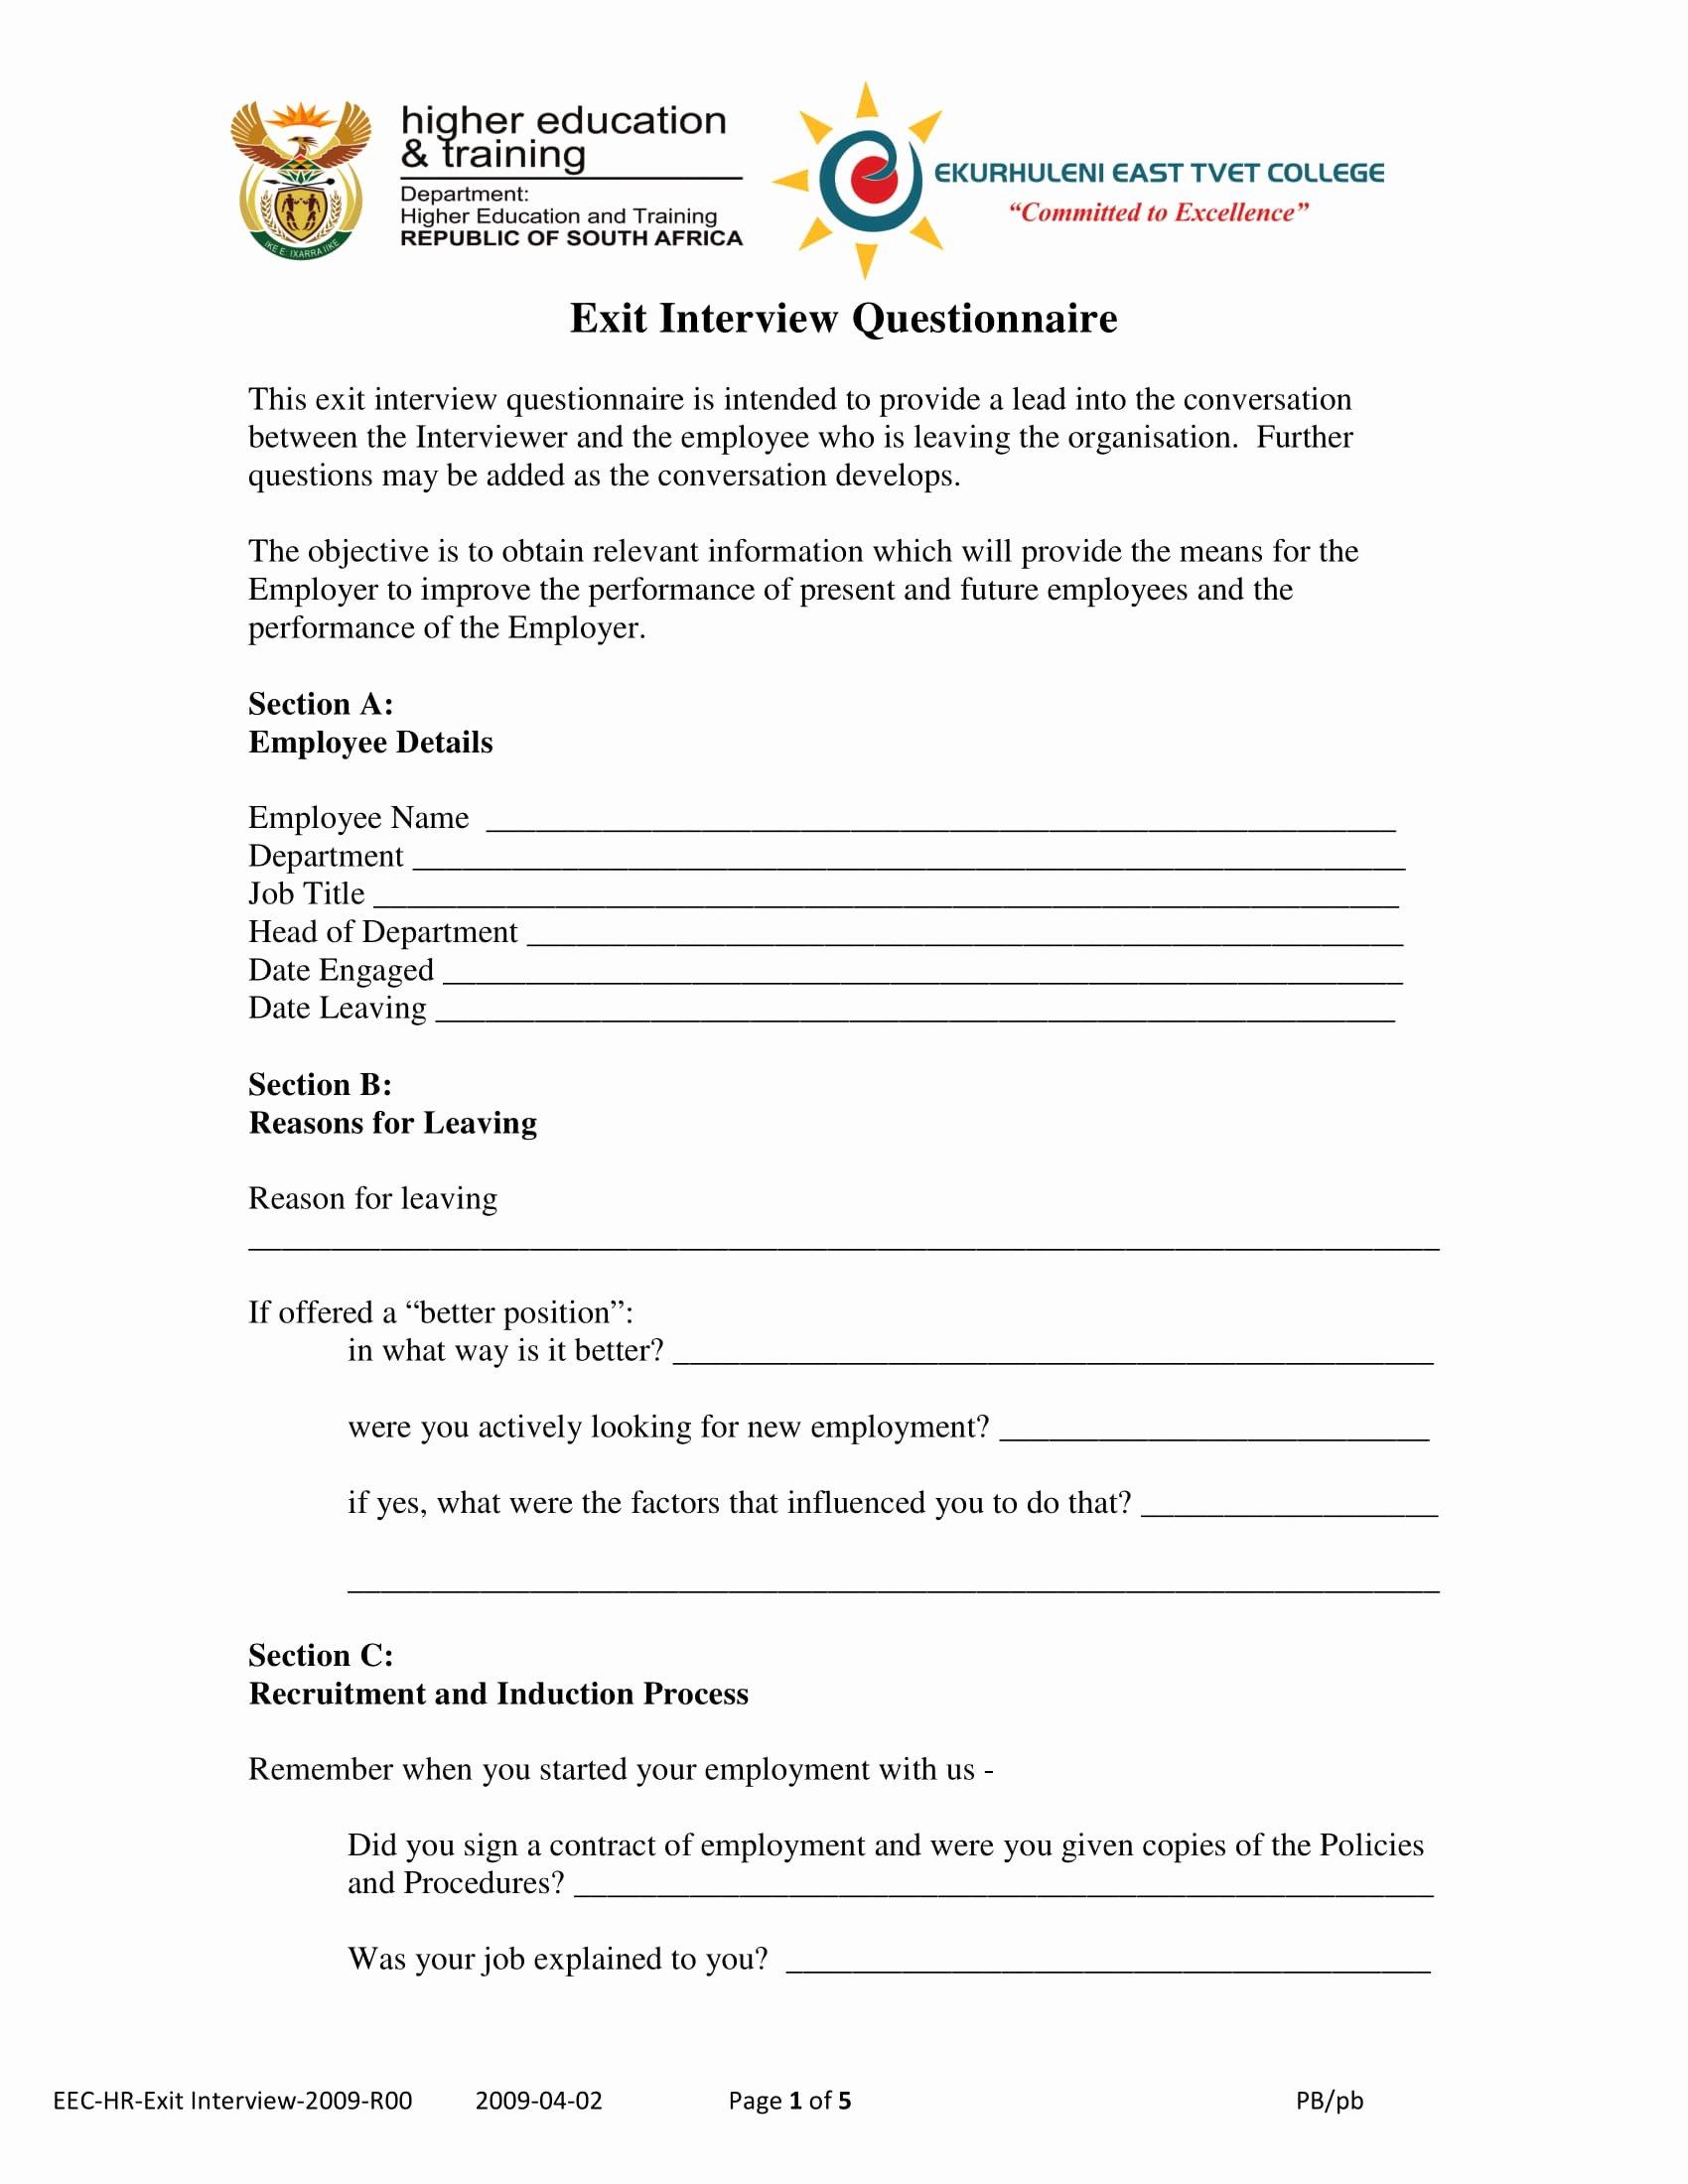 Exit Interview form Pdf Elegant 9 Exit Interview form Examples Pdf